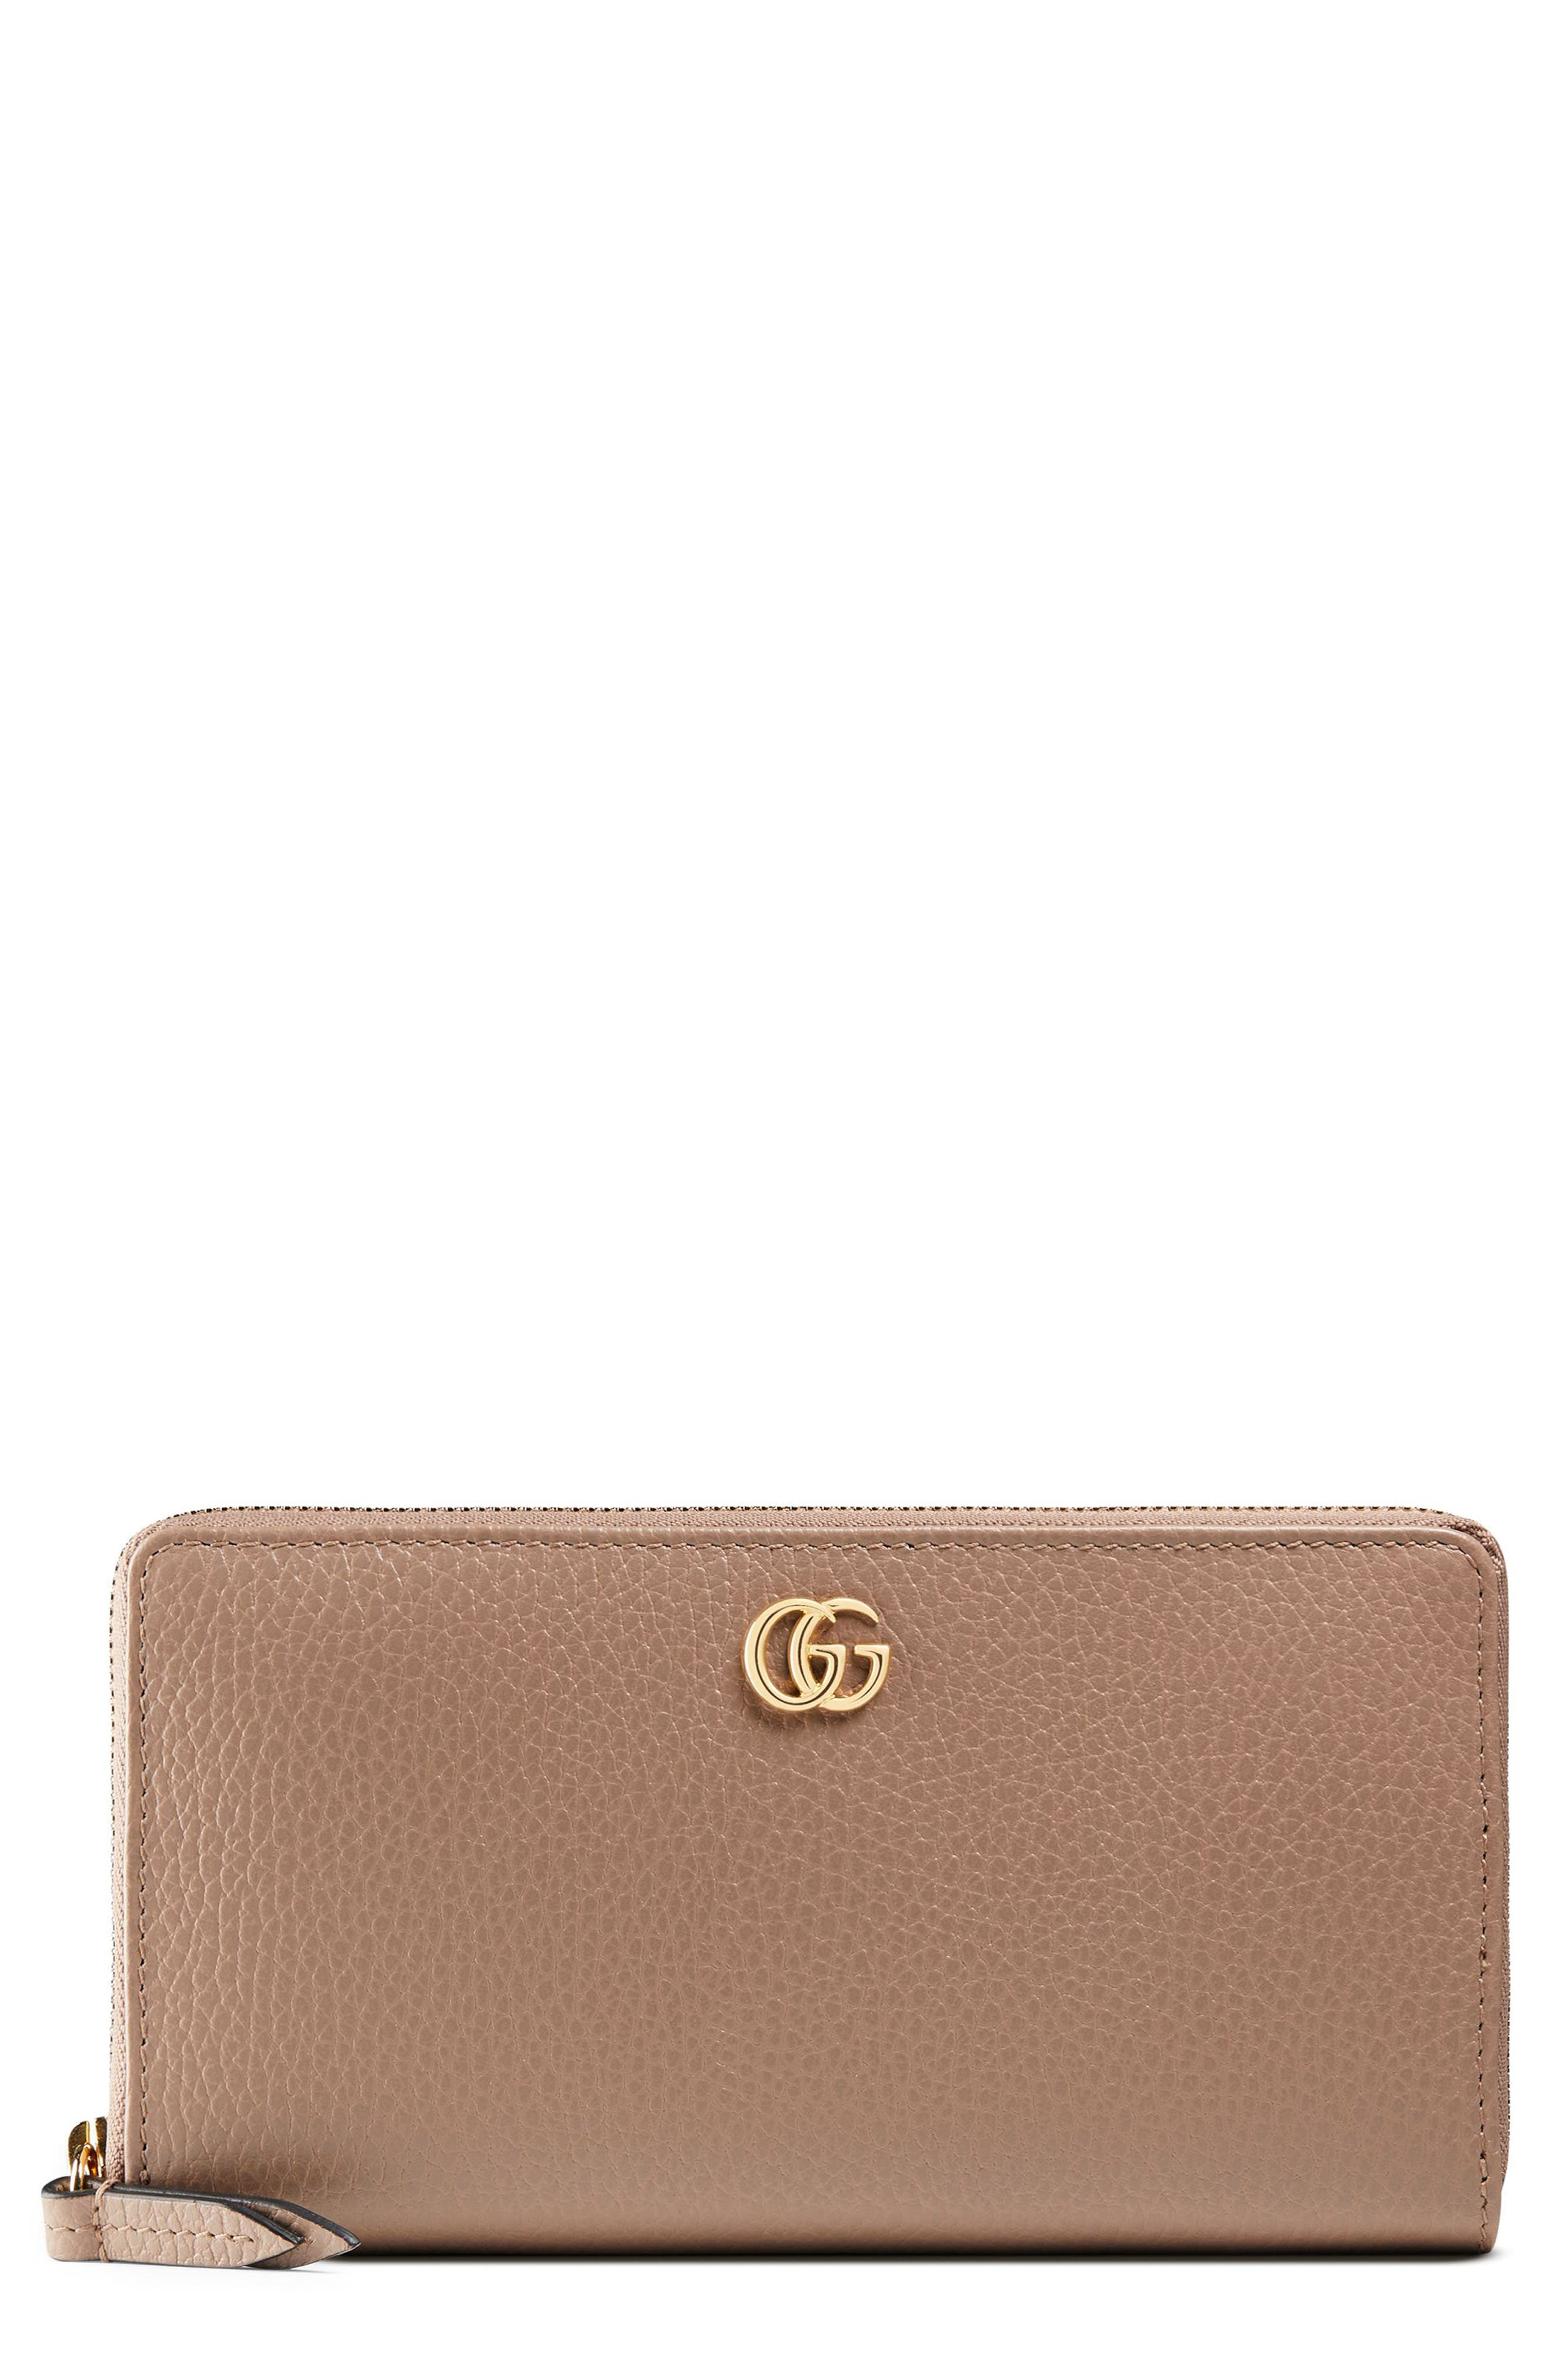 GUCCI Petite Marmont Leather Zip Around Wallet, Main, color, PORCELAIN ROSE